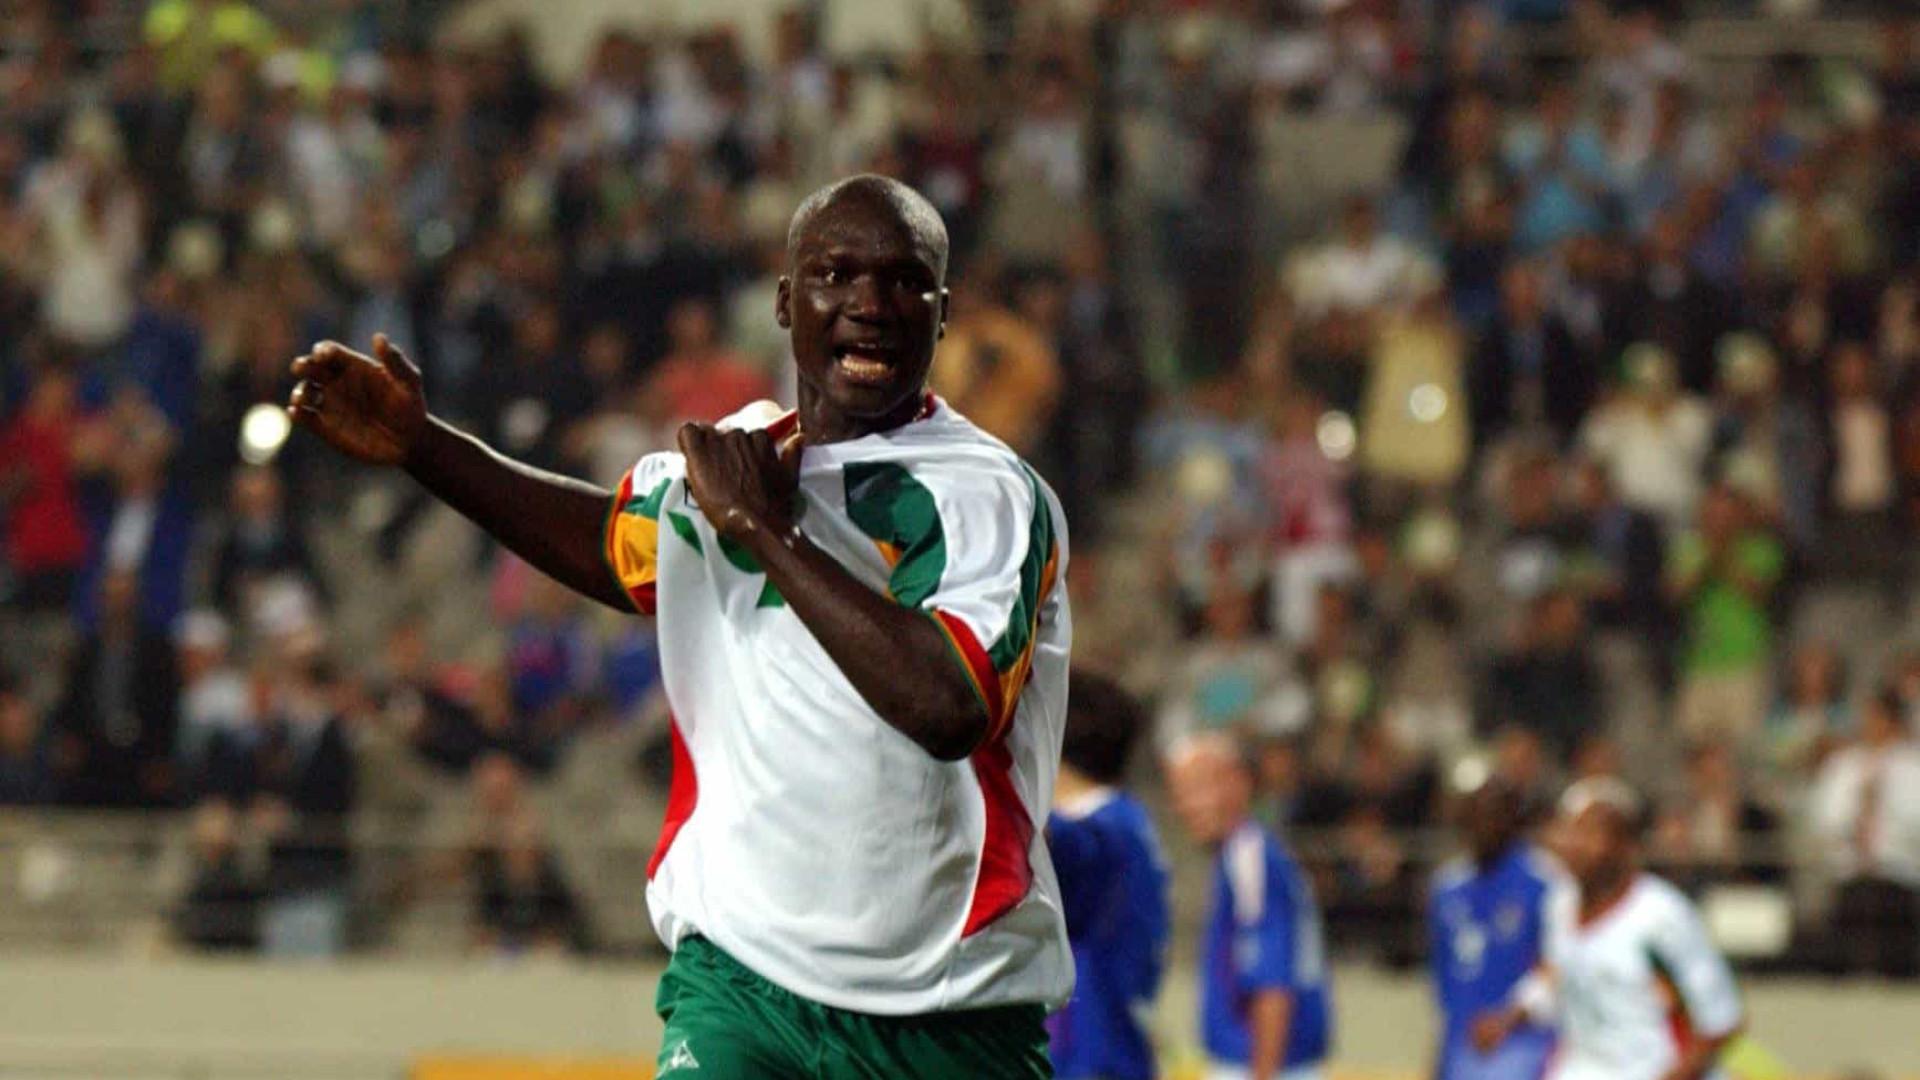 Destaque do Senegal na Copa de 2002, ex-meia Diop morre aos 42 anos